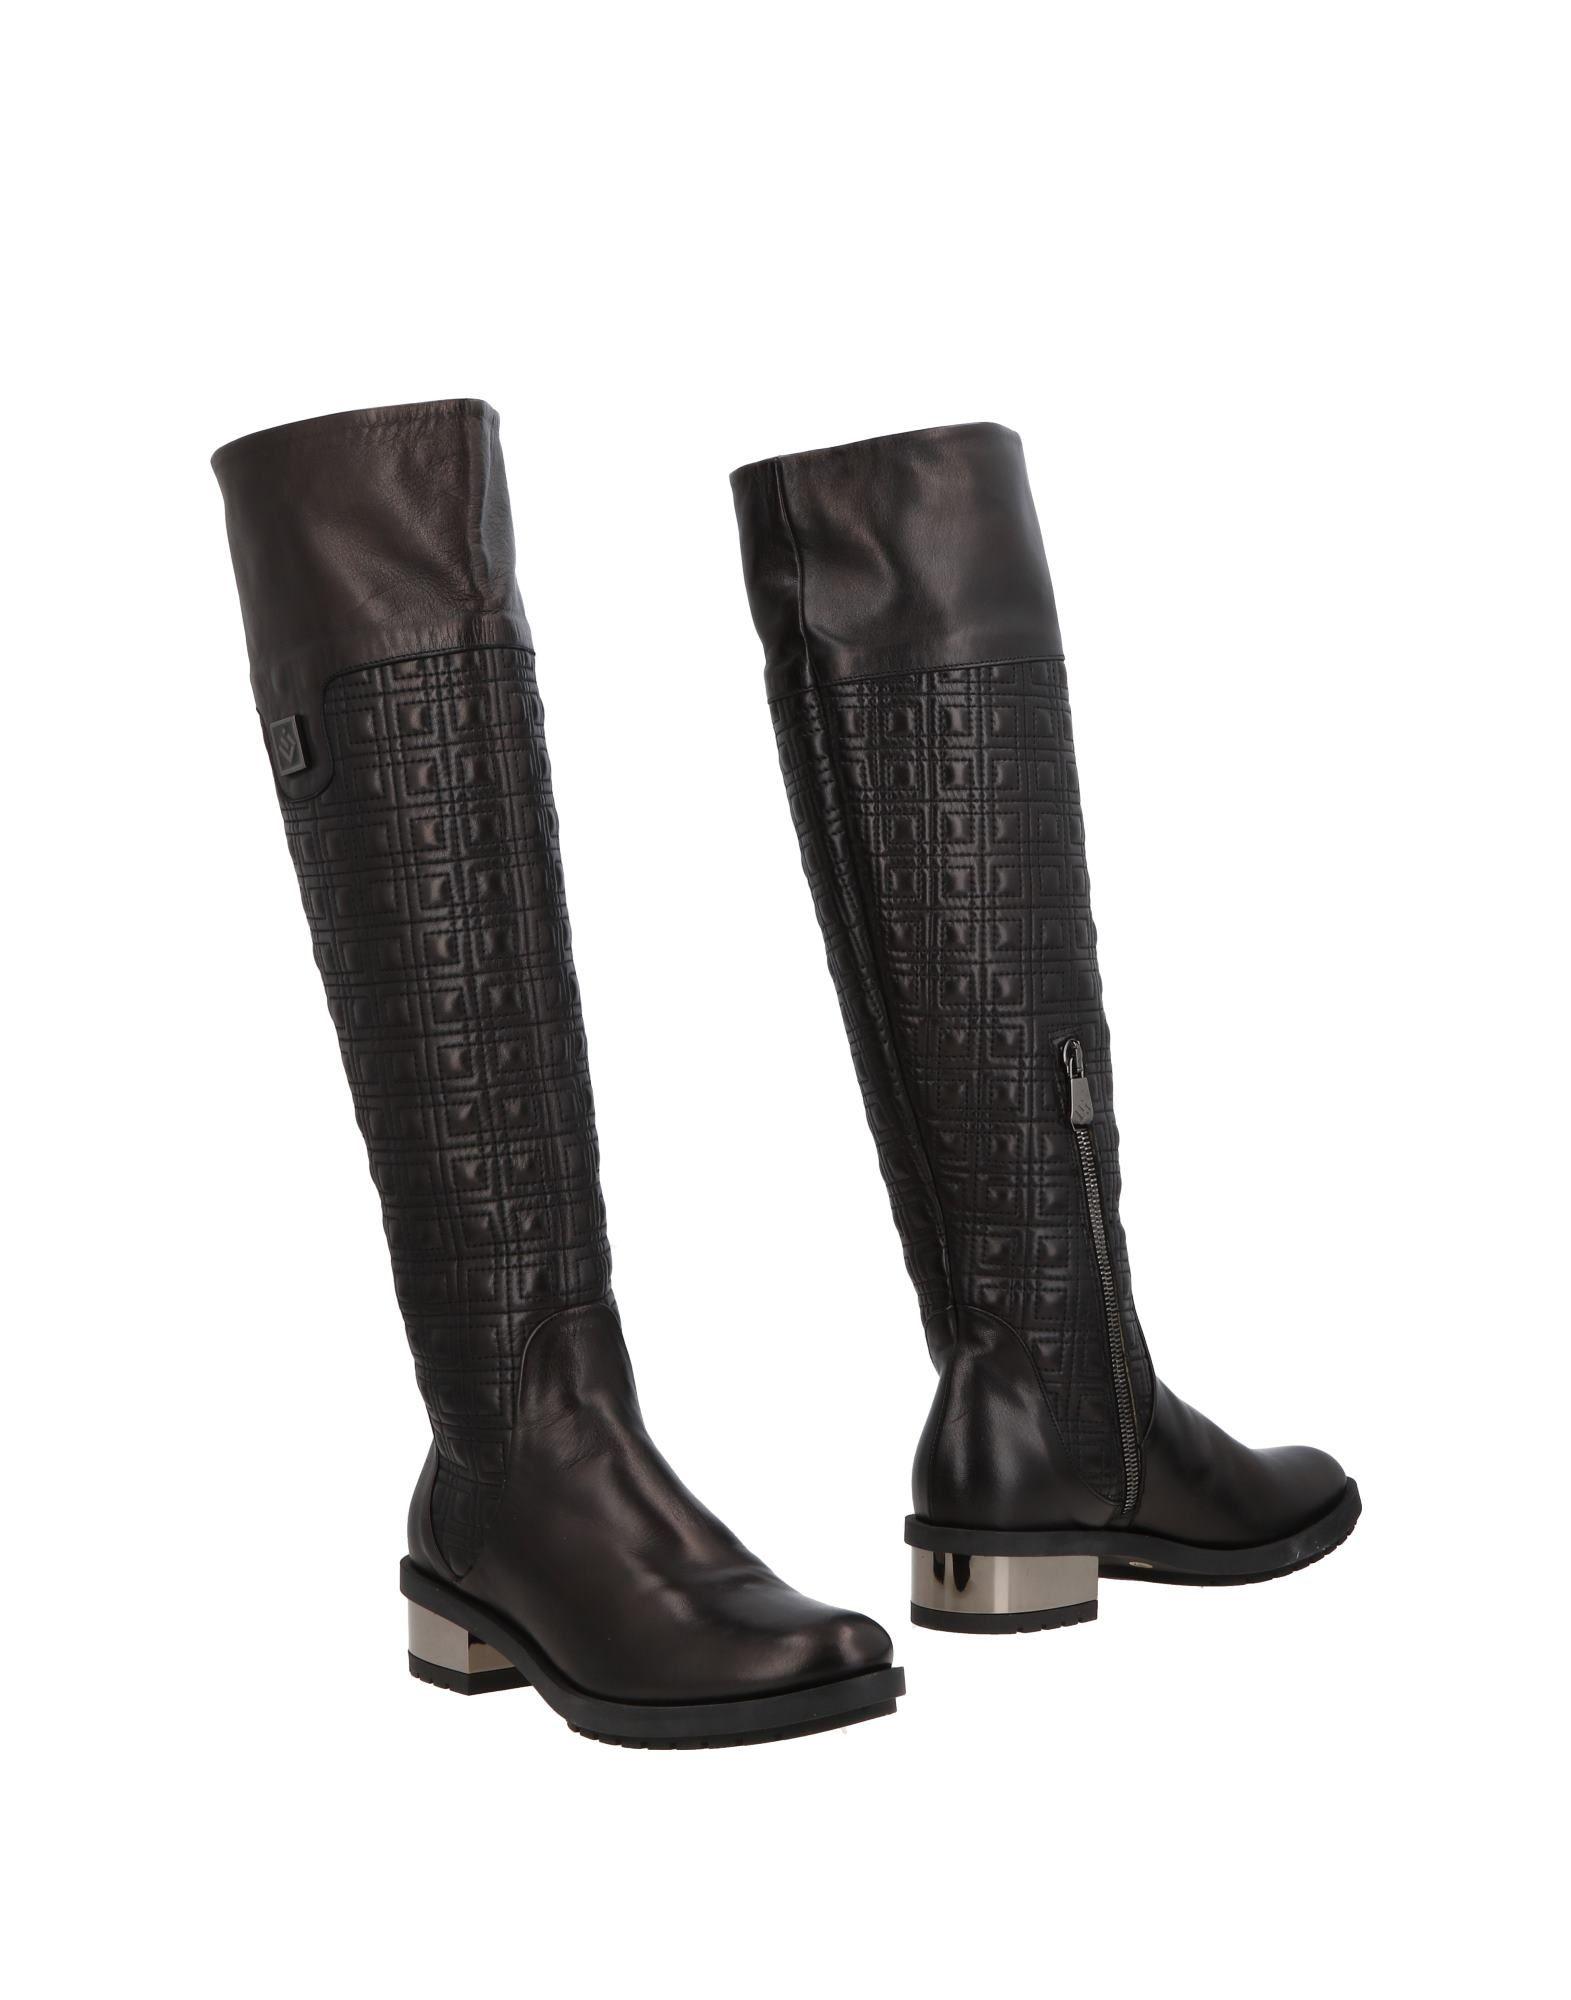 Leonardo Iachini Boots - Women Leonardo Iachini Boots online 11498910PB on  Australia - 11498910PB online 7225f9